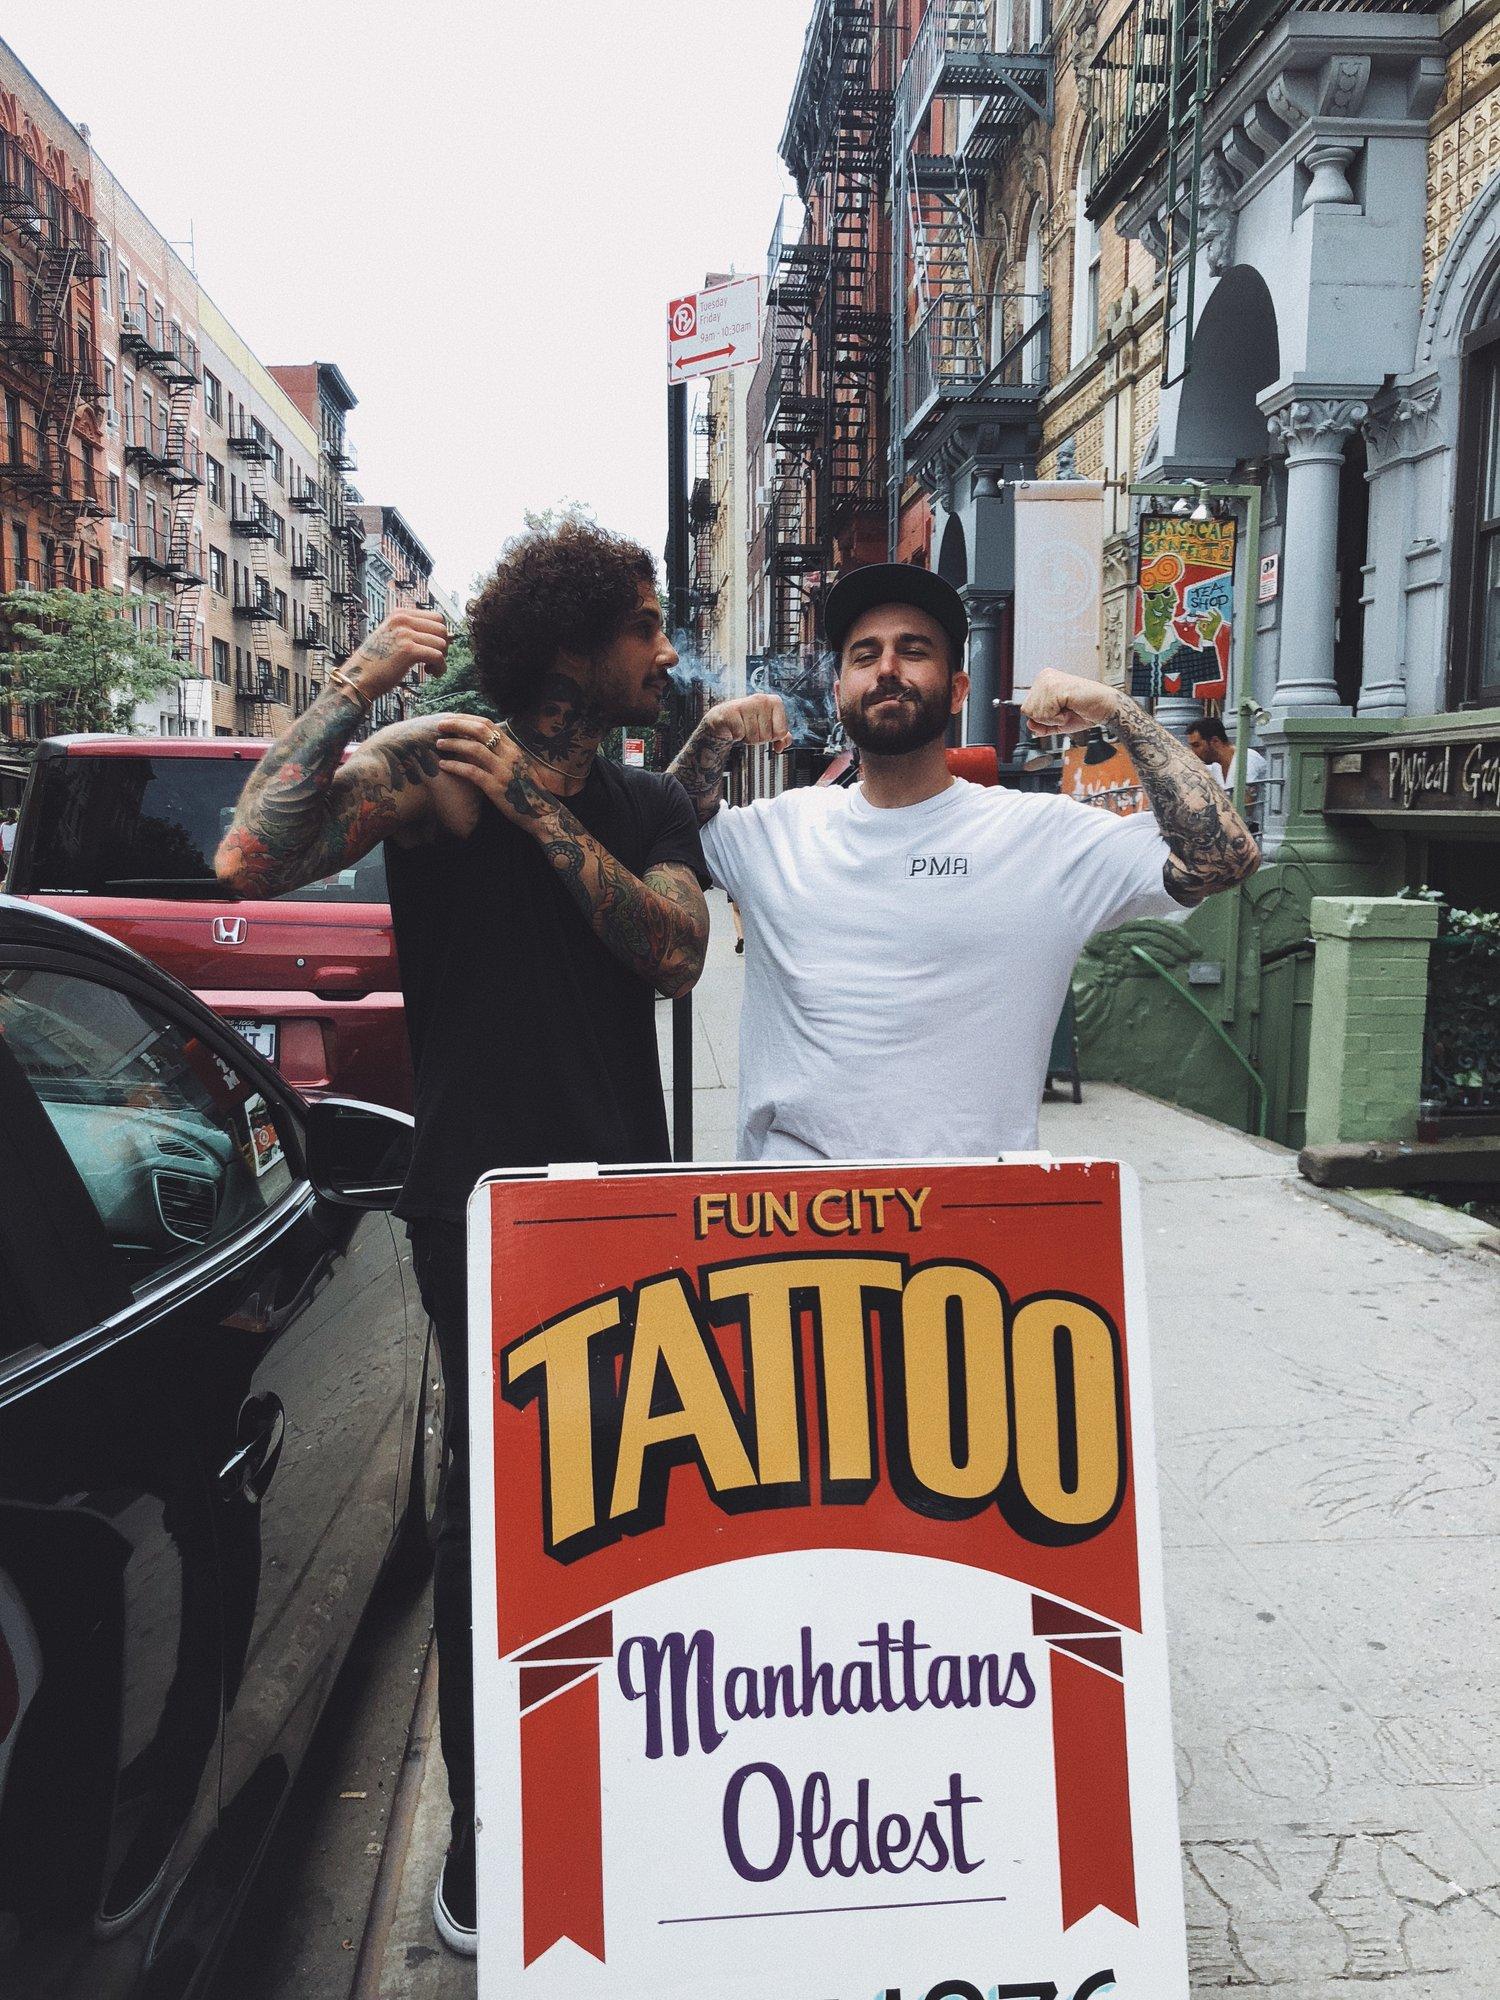 Fun City Tattoo